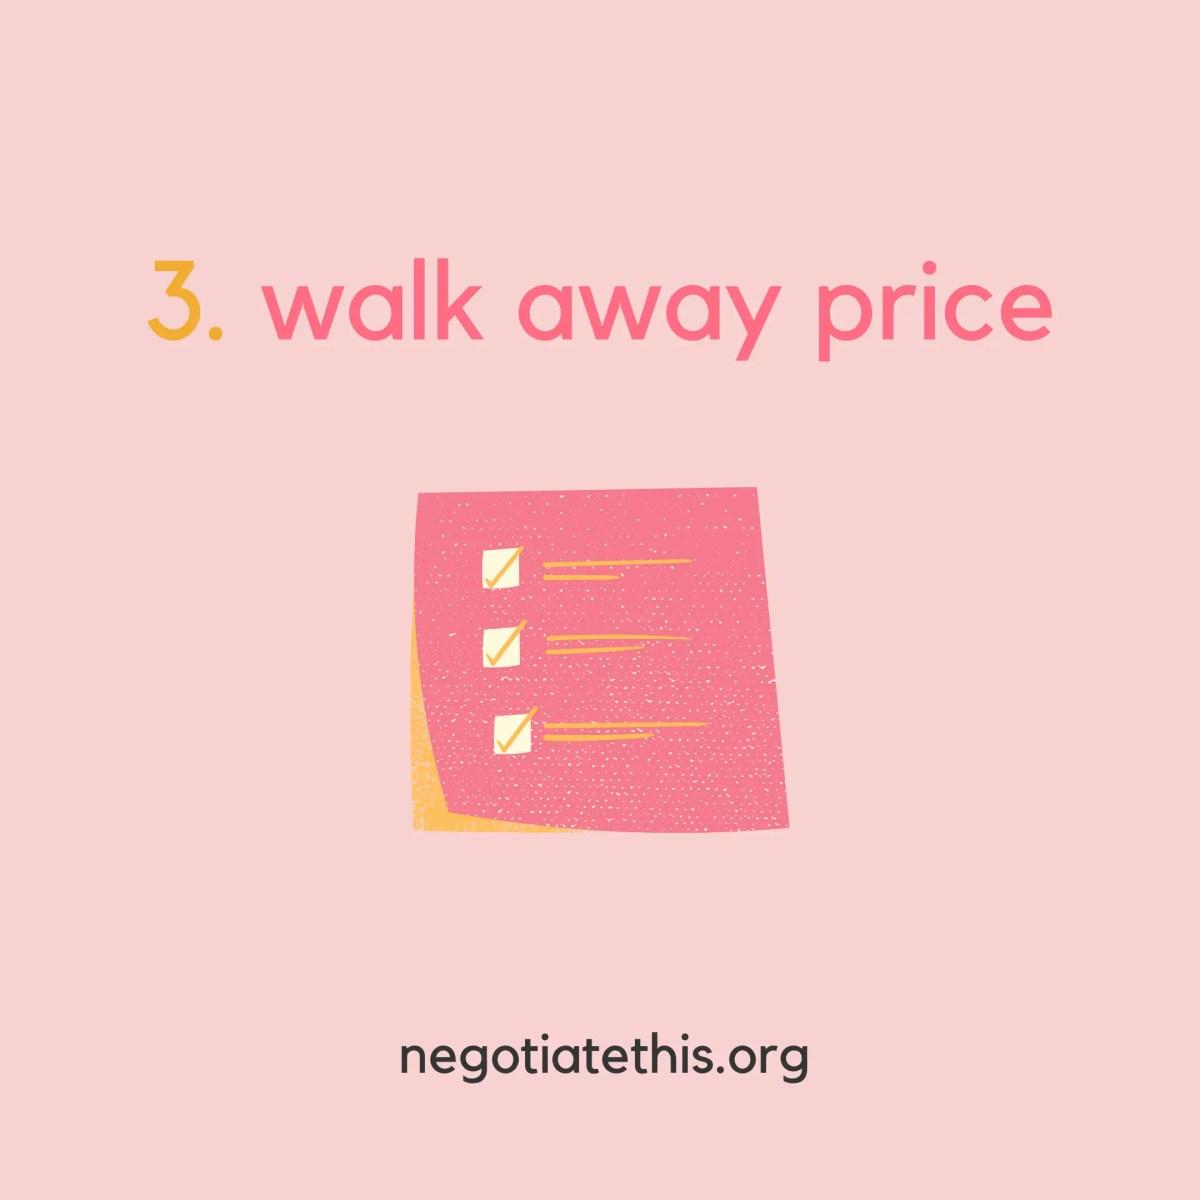 3 walk away price